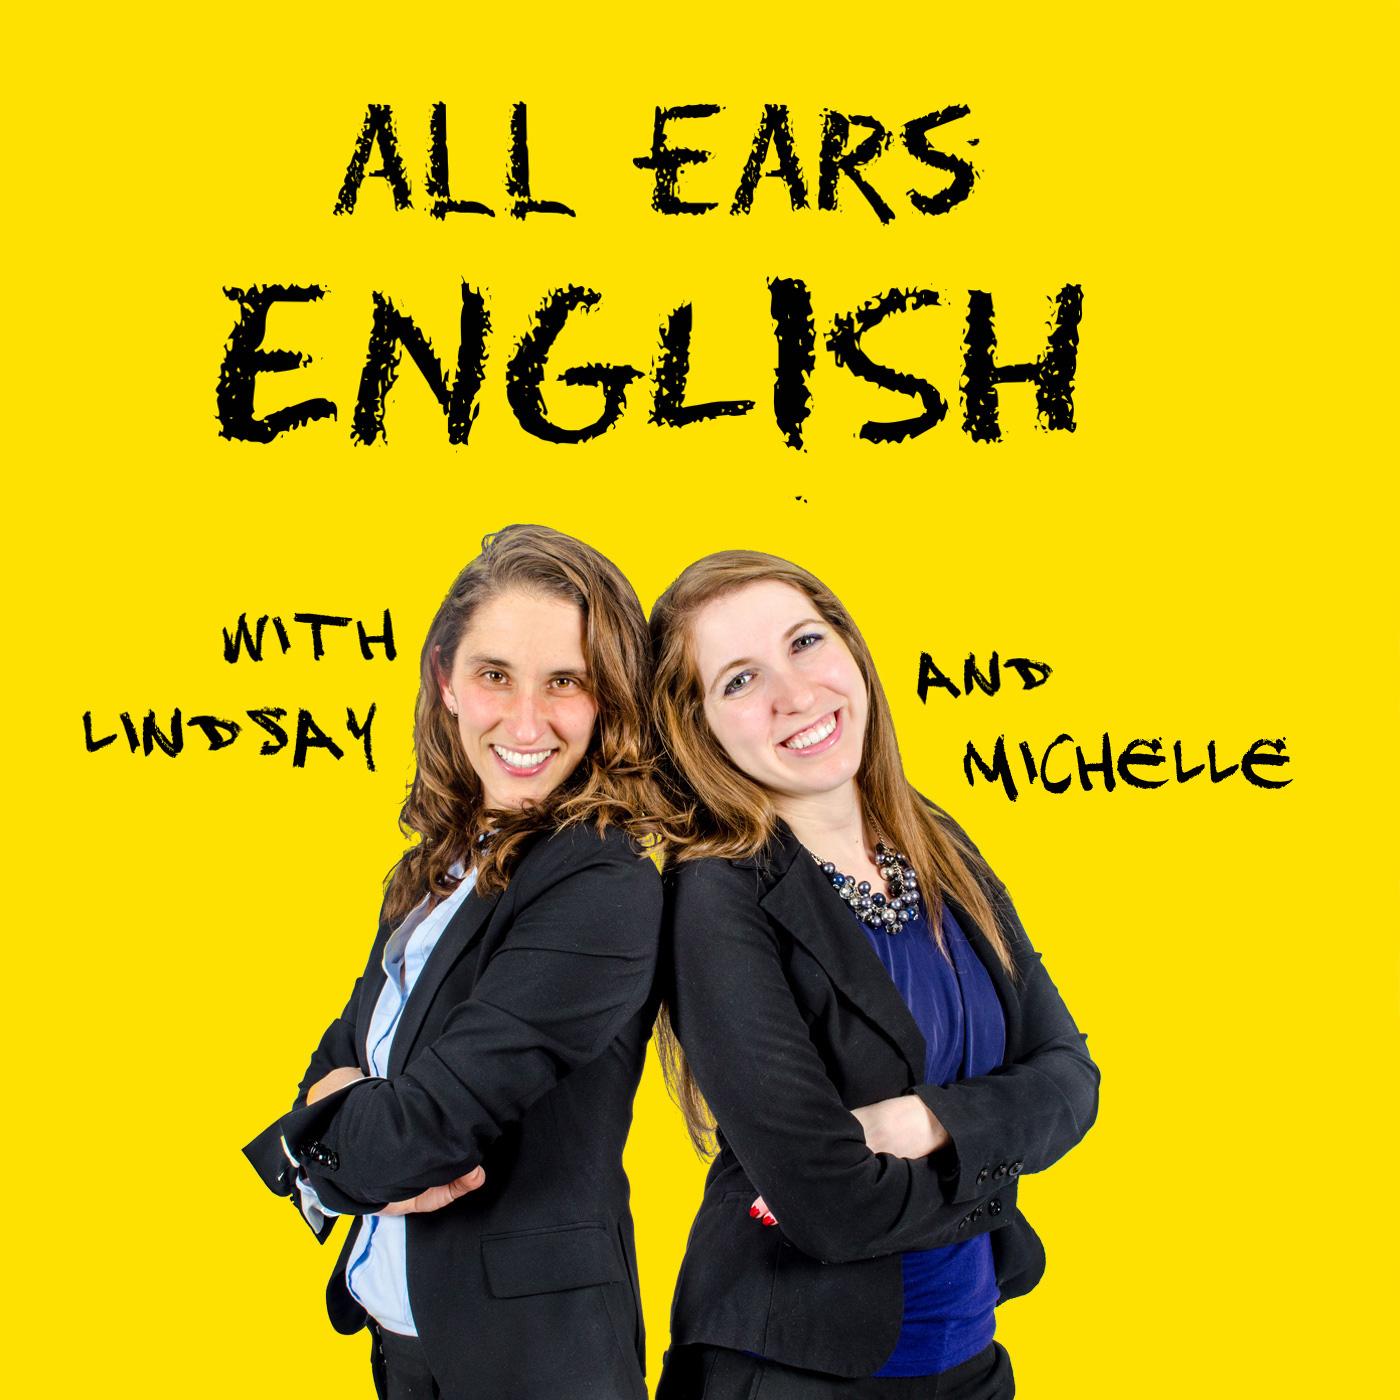 AEE 1389: Grammar Part 7: A Simple Way to Sharpen Business English Communication show art